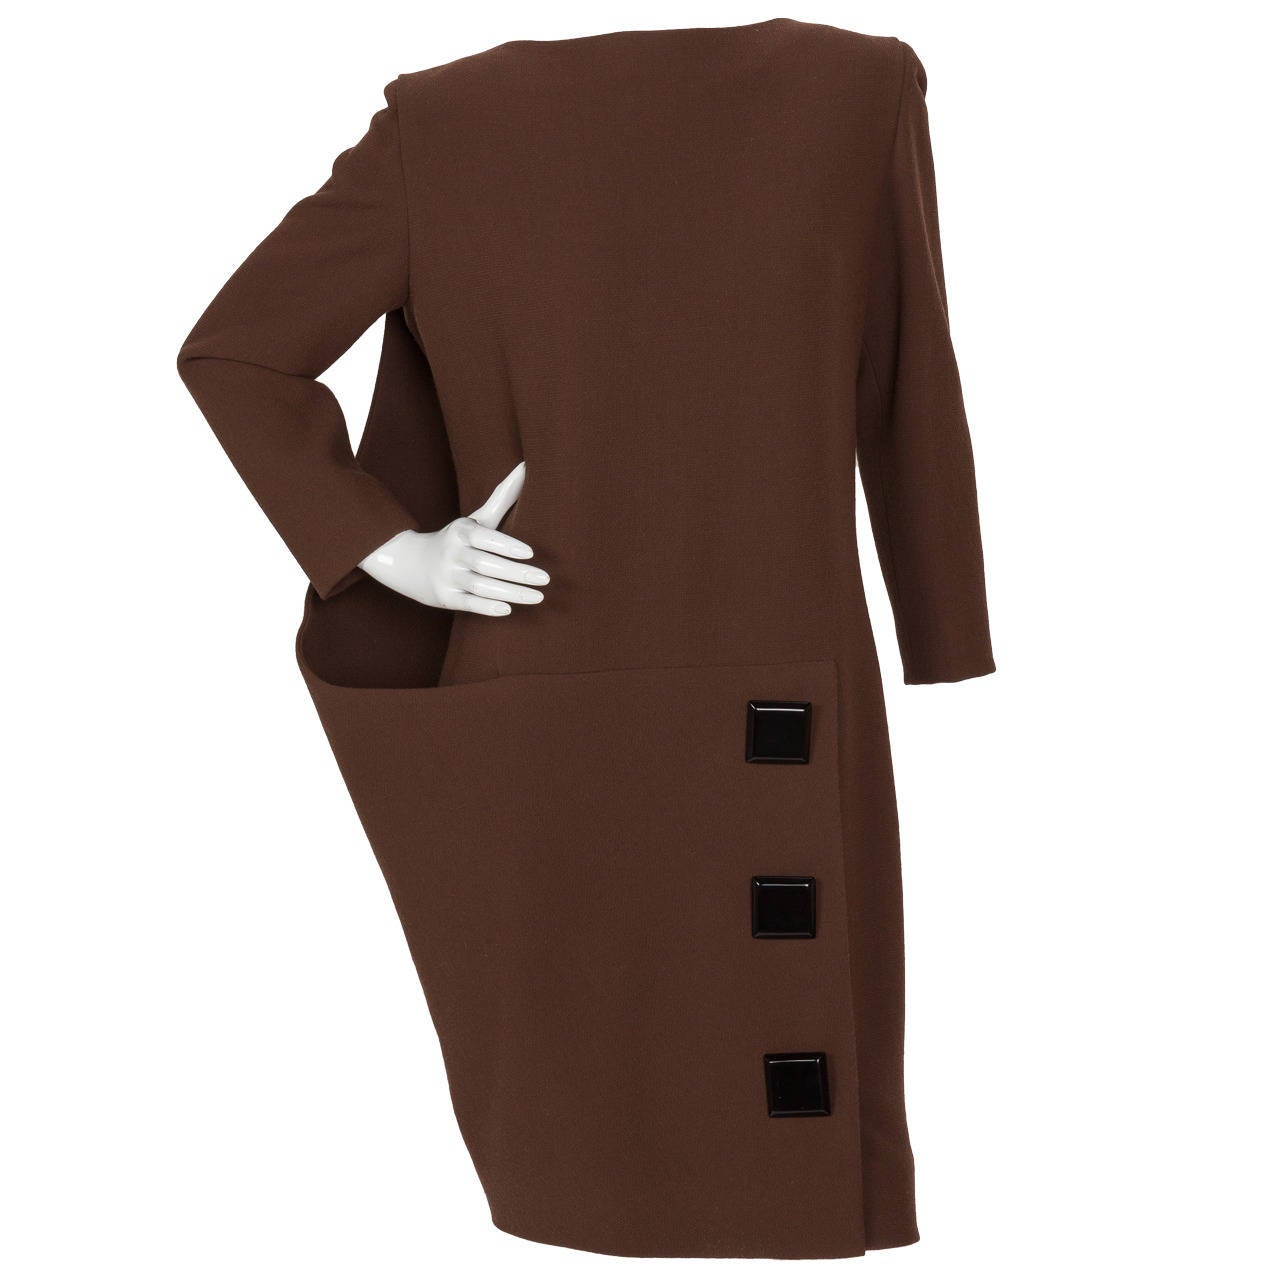 Avant Garde Pierre Cardin Haute Couture Asymmetric Wool Cocktail Dress ca. 1992 For Sale